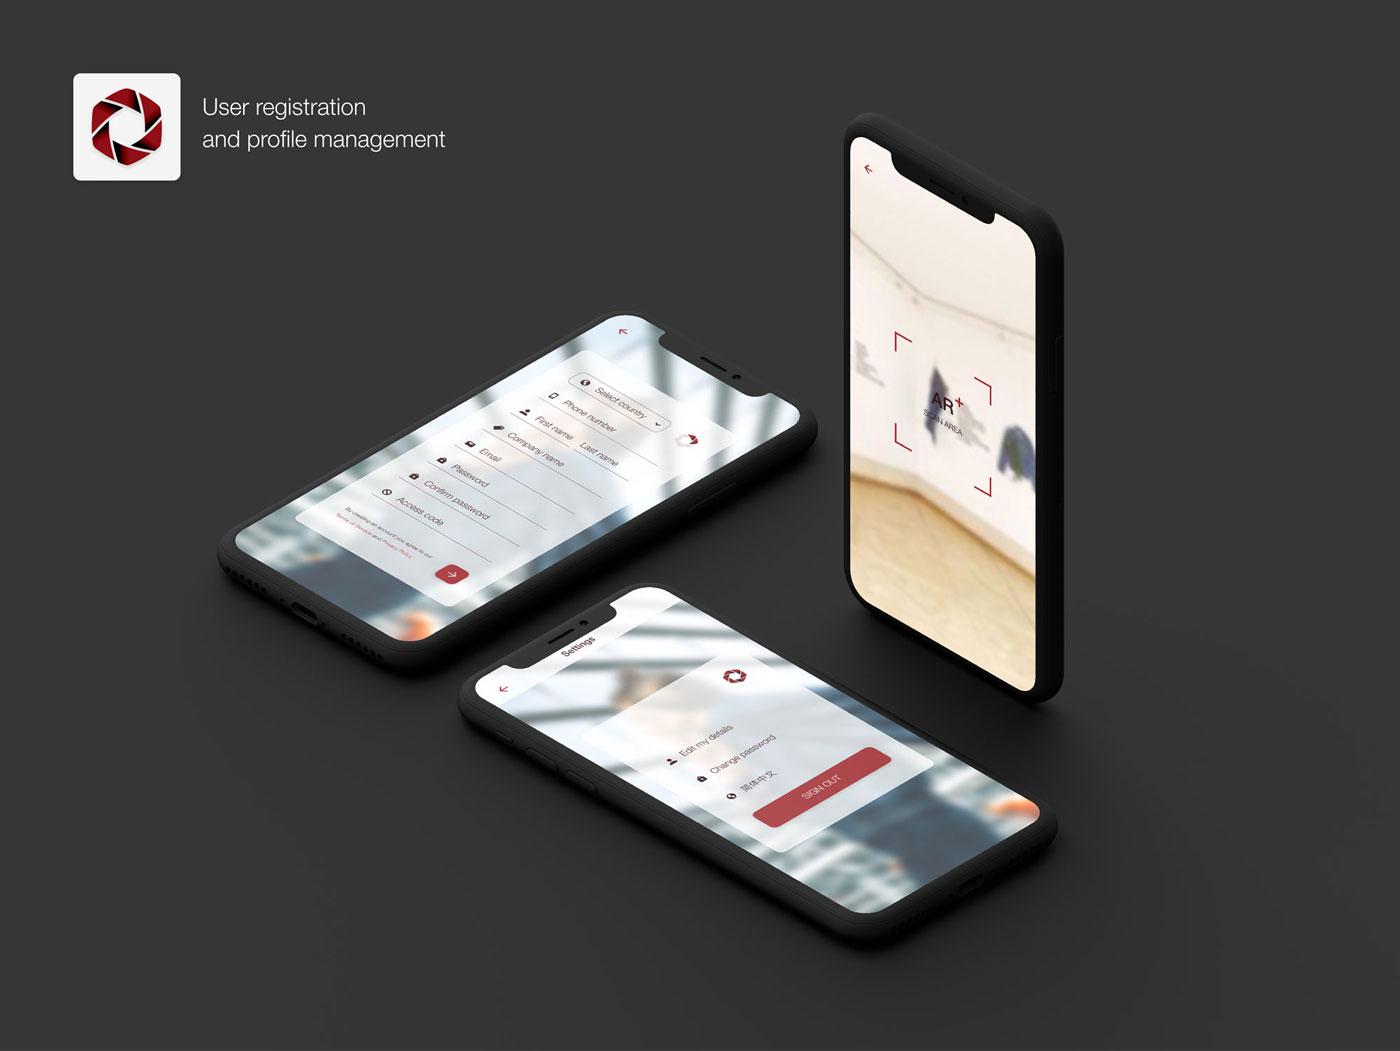 NEO-ARX_Advance_denim_mobile_user_information